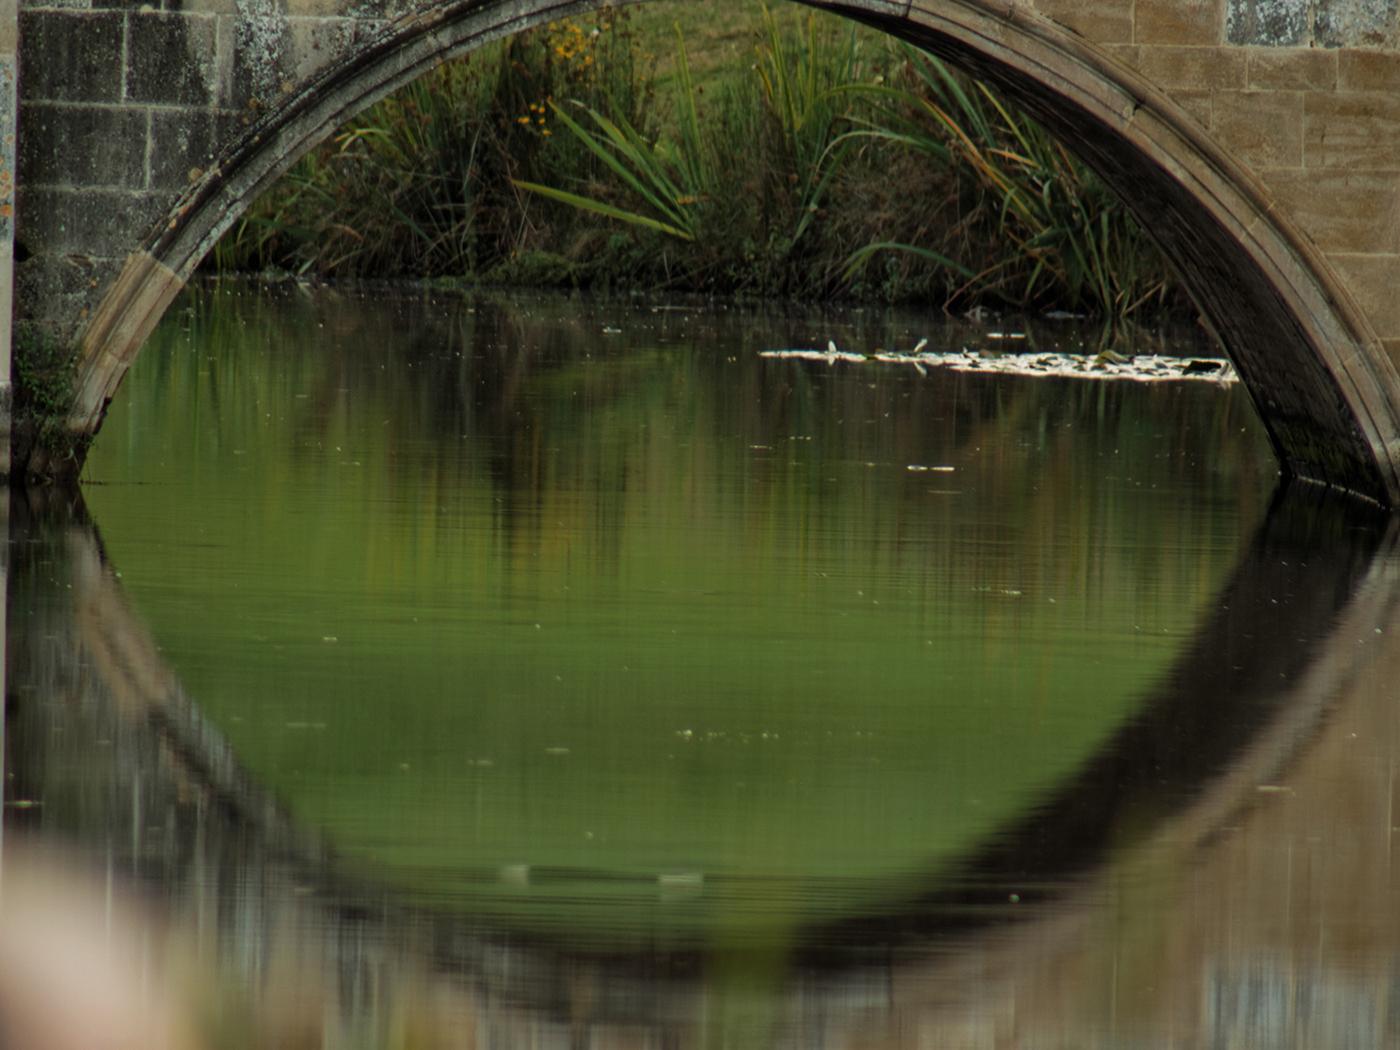 THE EYE OF THE BRIDGE by Ray Mengham.jpg